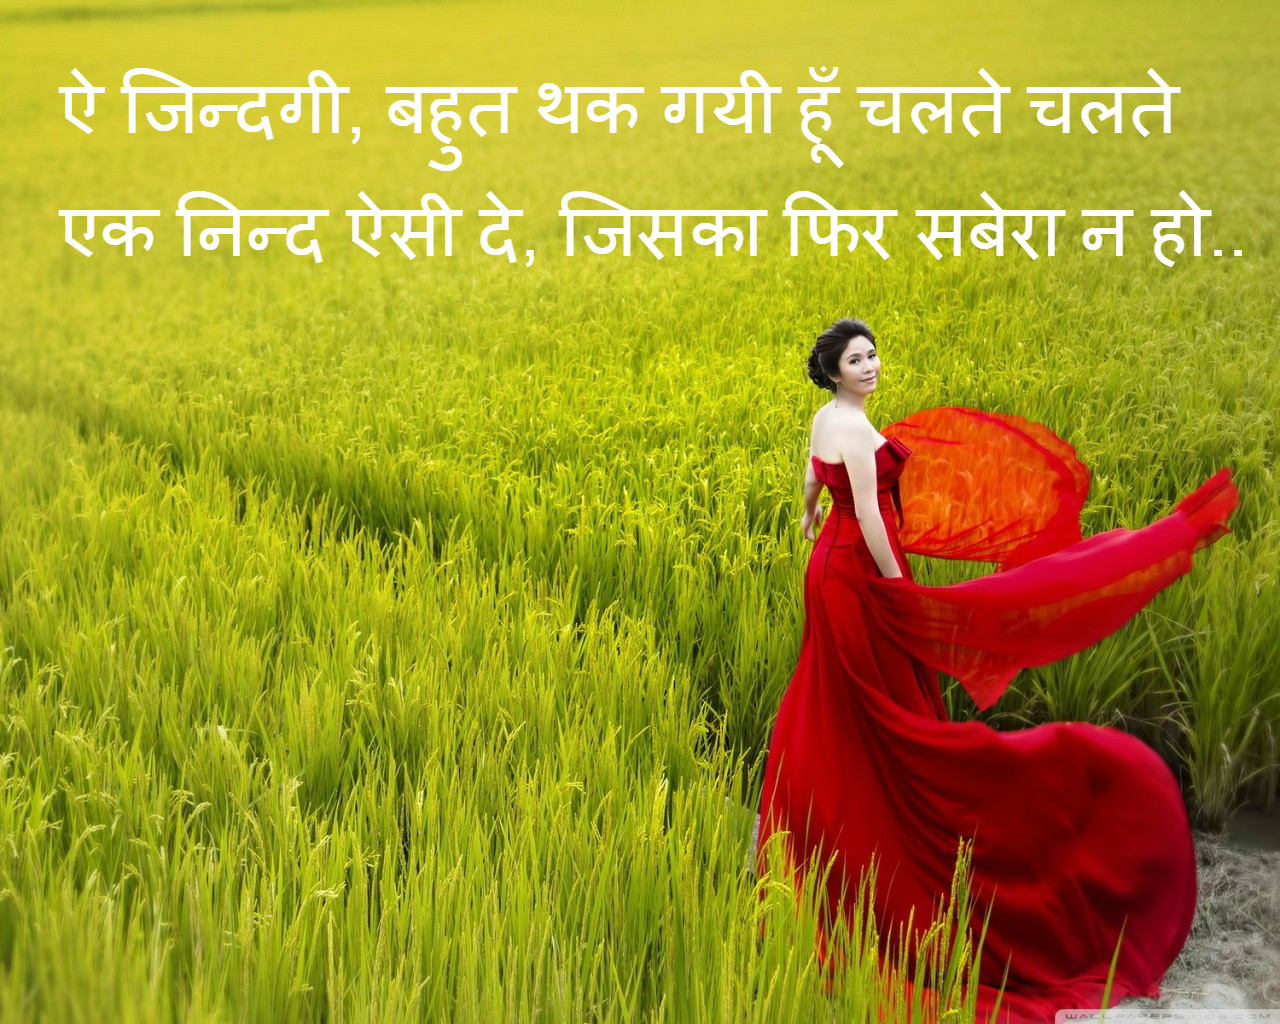 Image Of Love Shayari